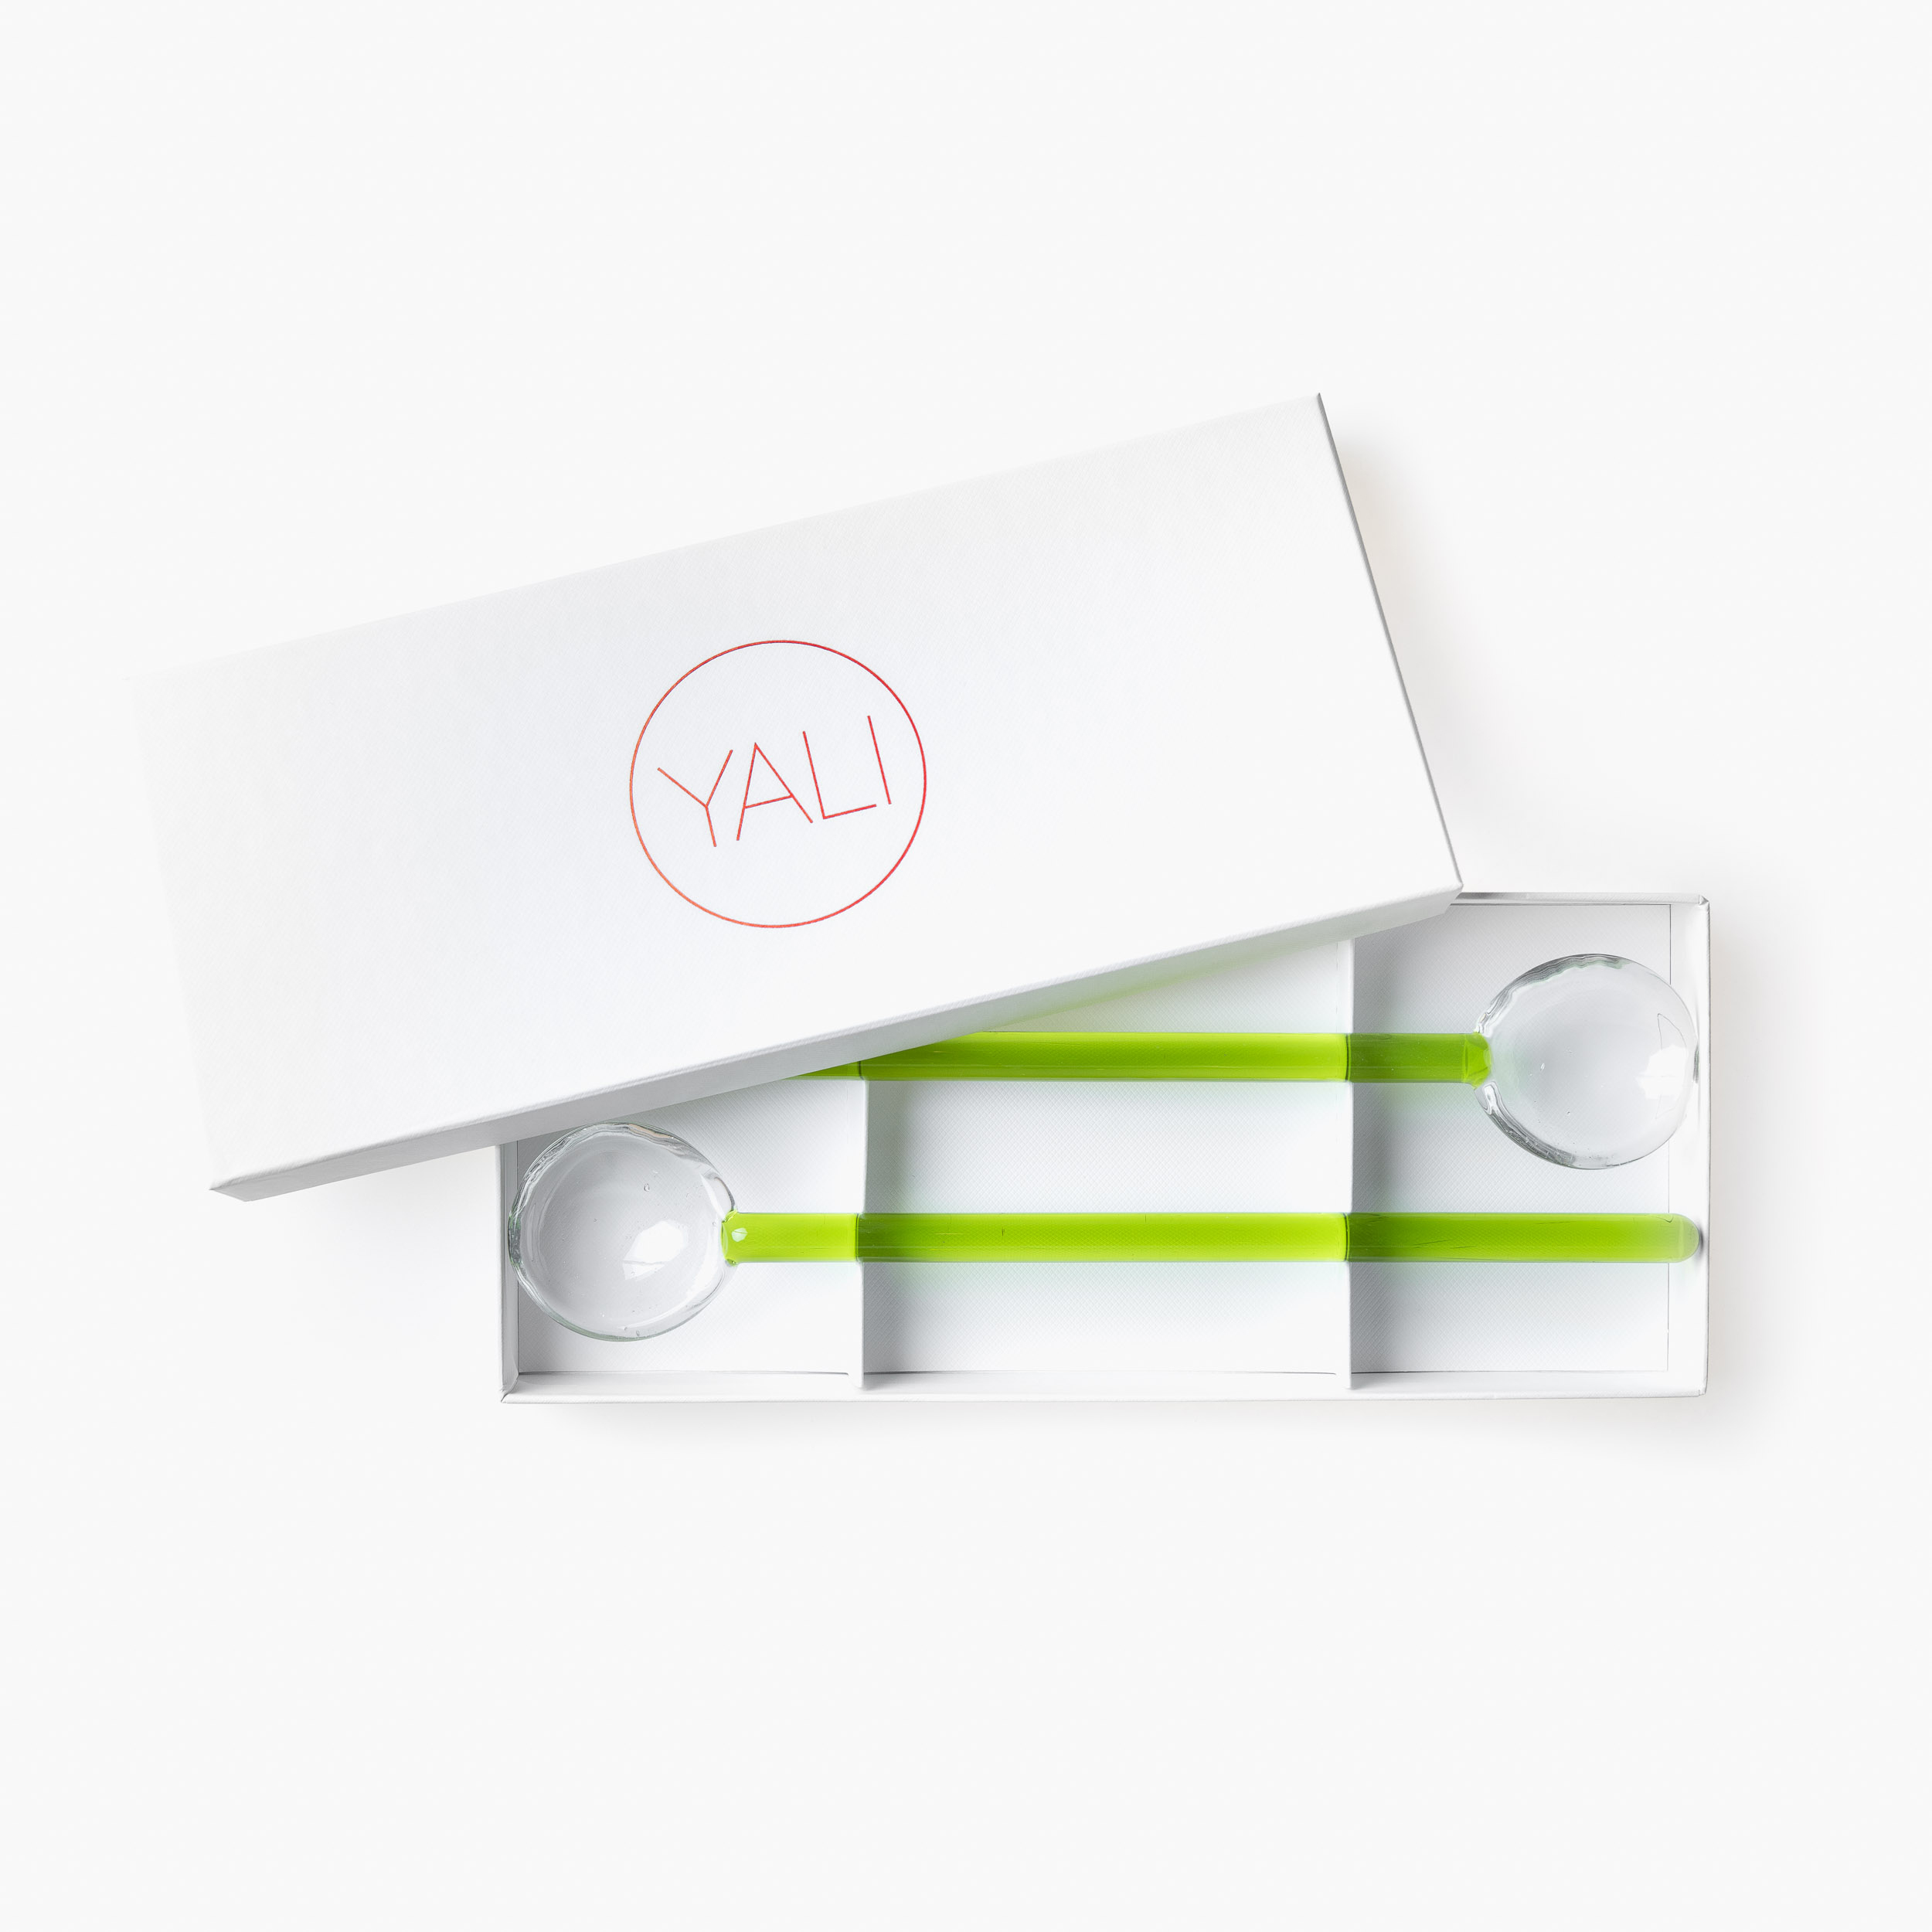 YALI-SALAD-SERVER-SET-LIME-7.jpg